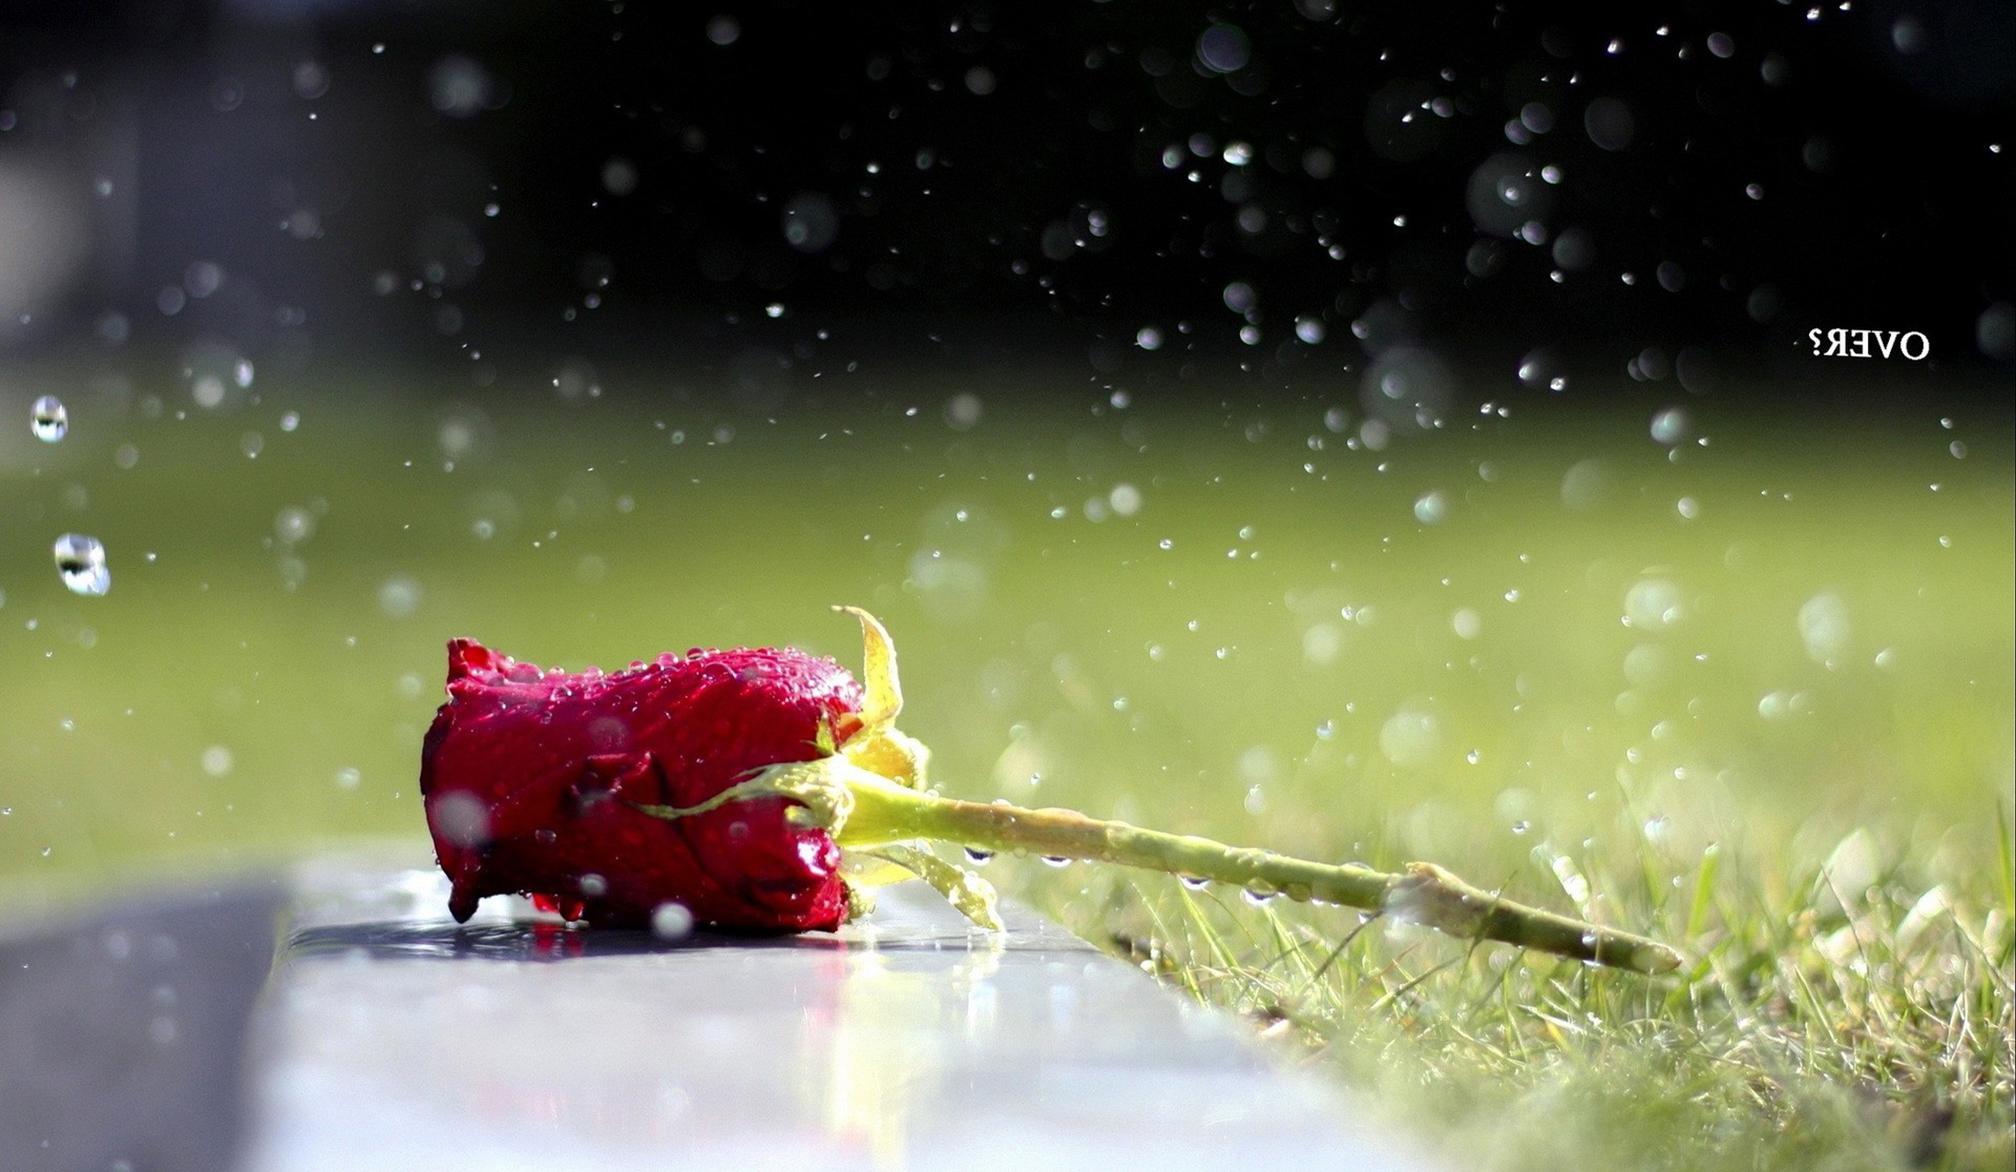 Wallpaper Single Red Rose Flower Water Drops 1920x1200 Hd: Rose With Water Drops Wallpapers (39 Wallpapers